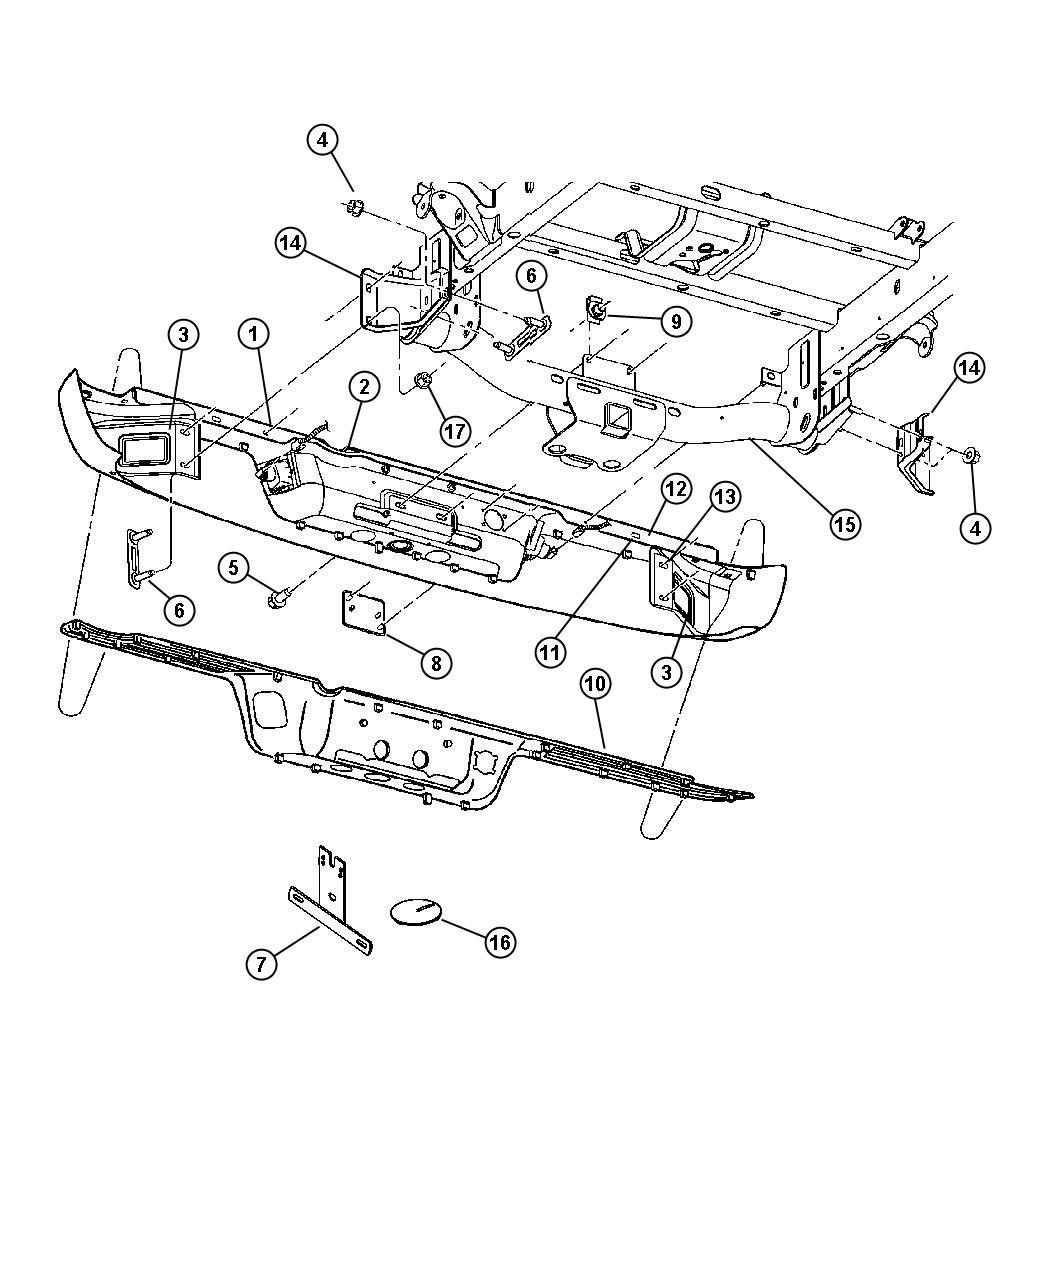 dodge ram 2500 wiring diagram frog inside plastic parts auto